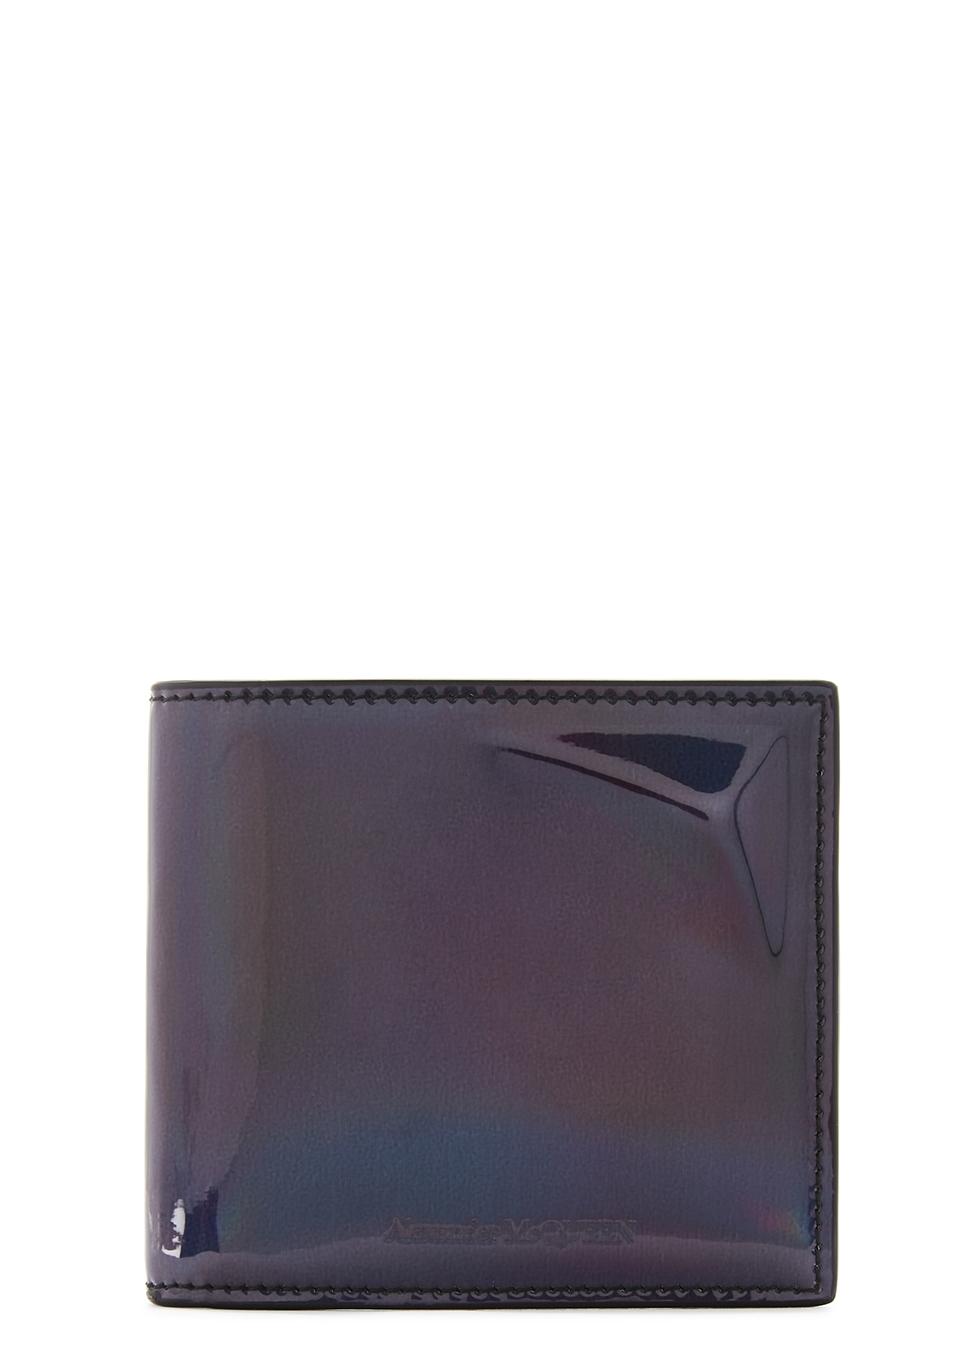 Iridescent gunmetal leather wallet